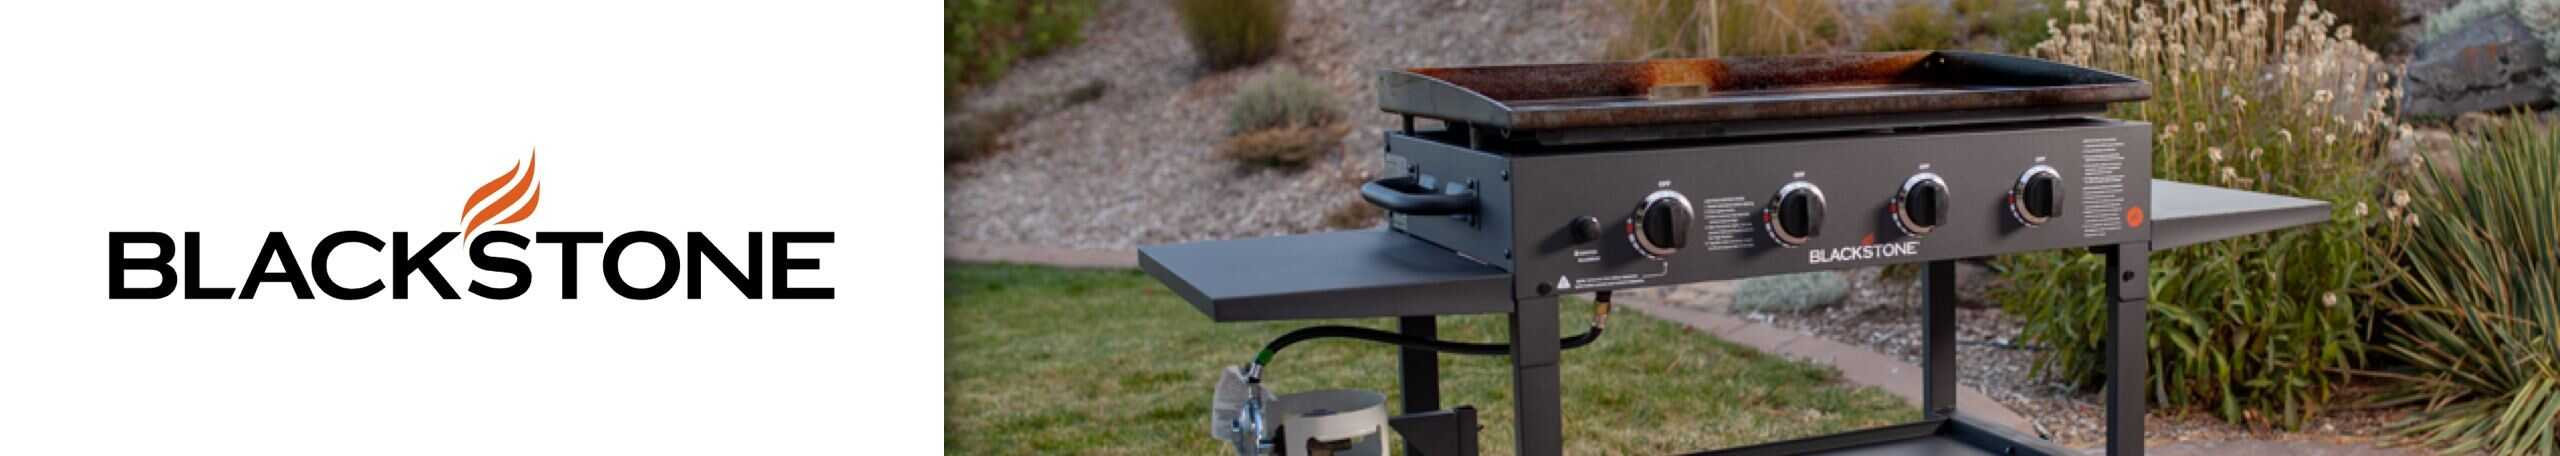 Blackstone griddle in backyard